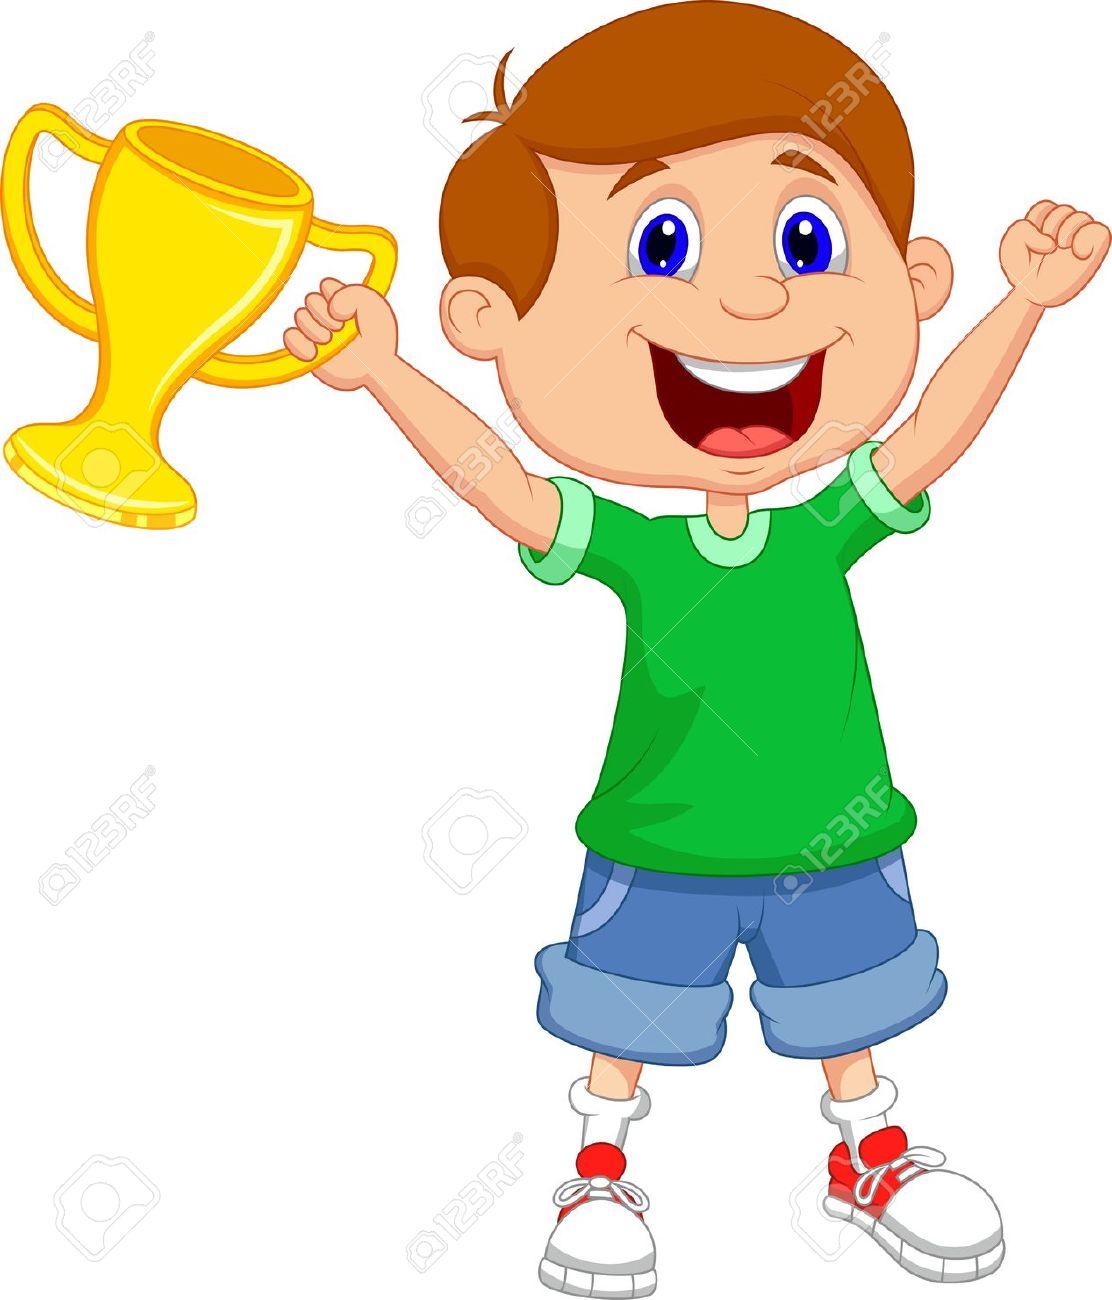 Clip Art Girl Win Clipart - Clipart Kid